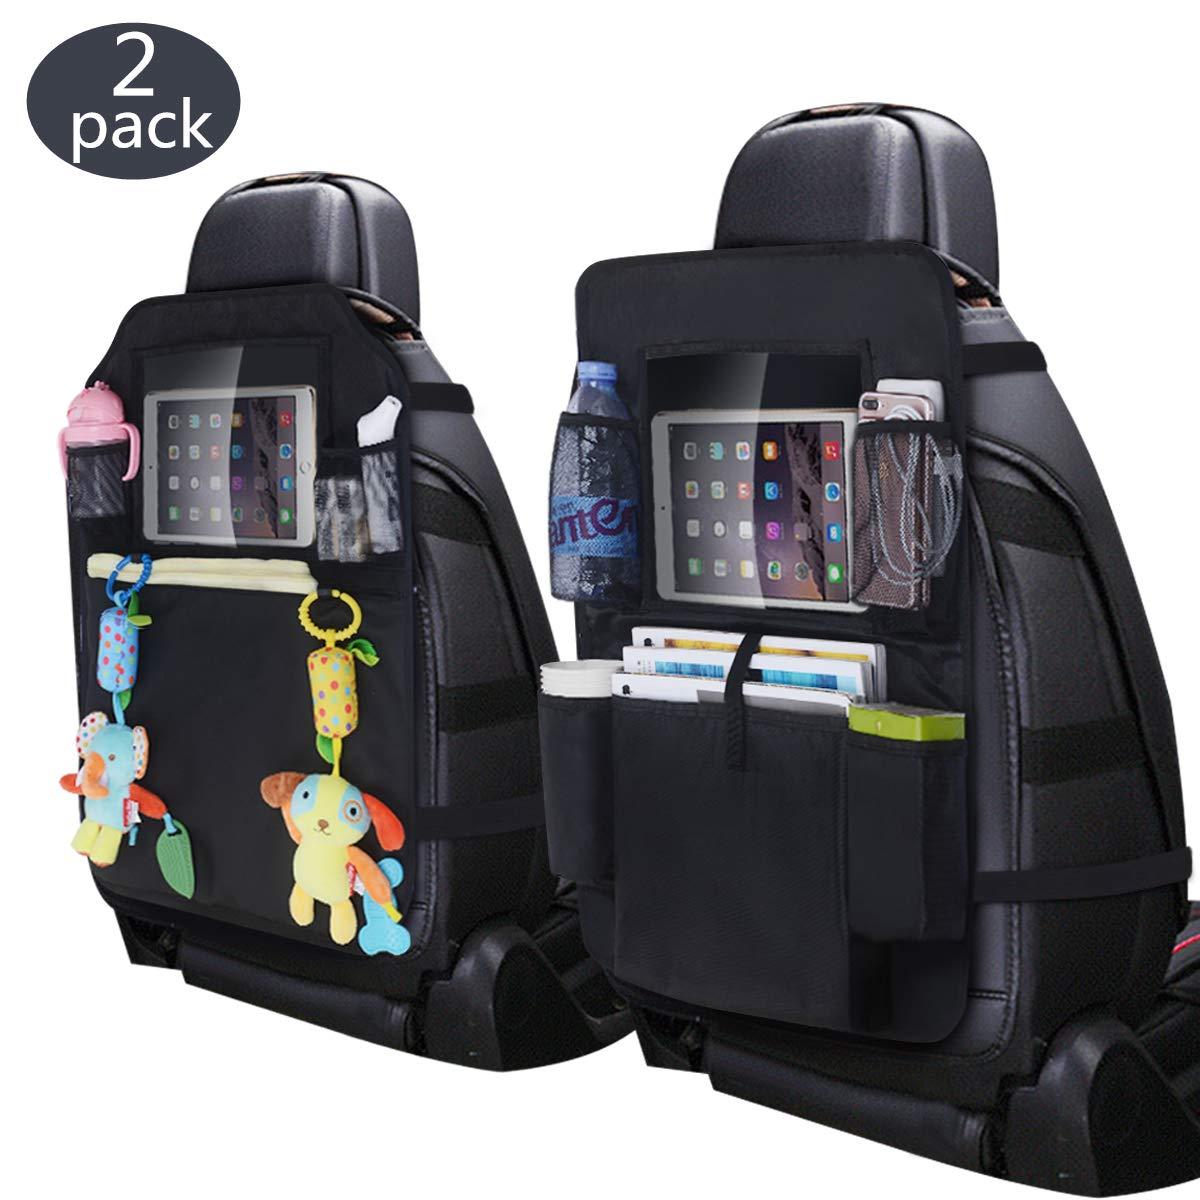 Inwee カーシートバックオーガナイザー タッチスクリーンタブレットホルダー付き マルチポケットと防水キックマットプロテクター 子供と幼児用 トラベルアクセサリー (2個パック)   B07G84DHPQ